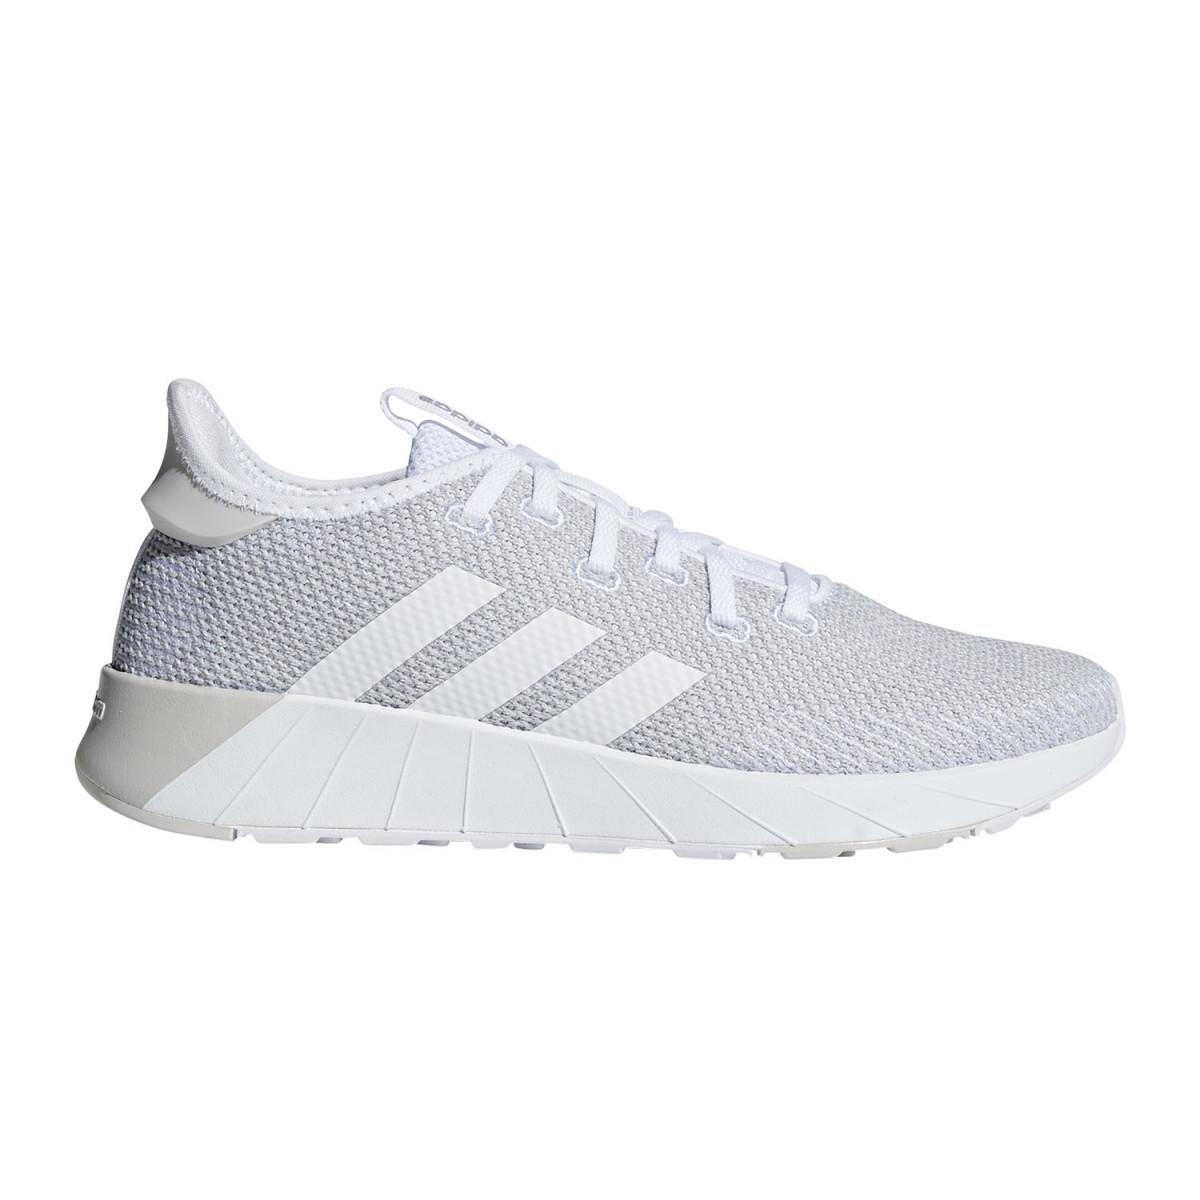 Zapatillas Adidas Questar X Byd